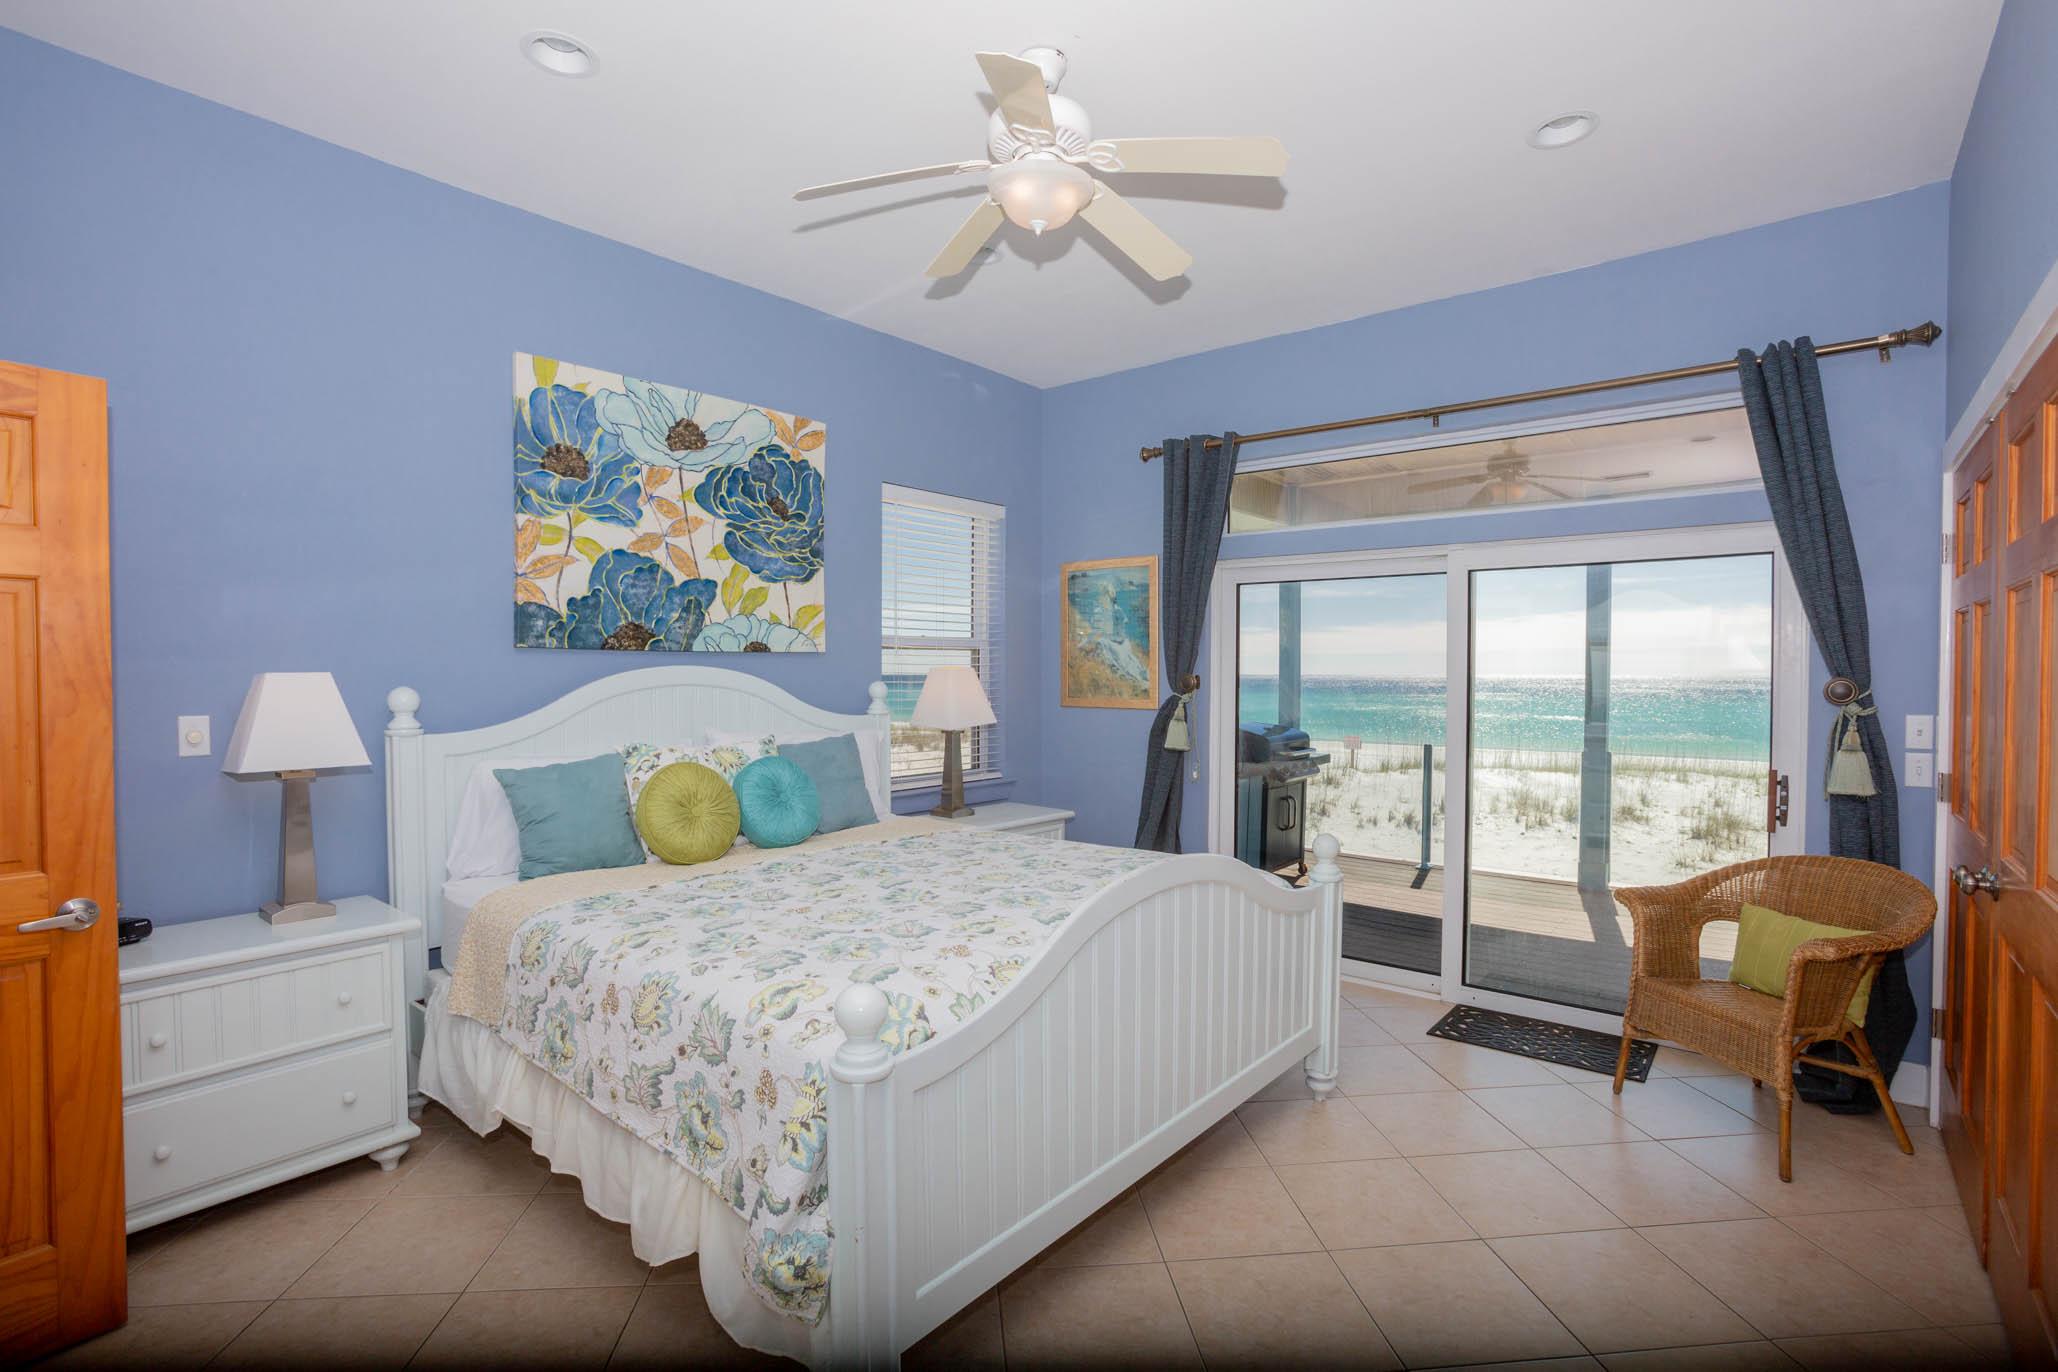 Ariola 1214 House/Cottage rental in Luxury Homes in Pensacola Beach Florida - #18